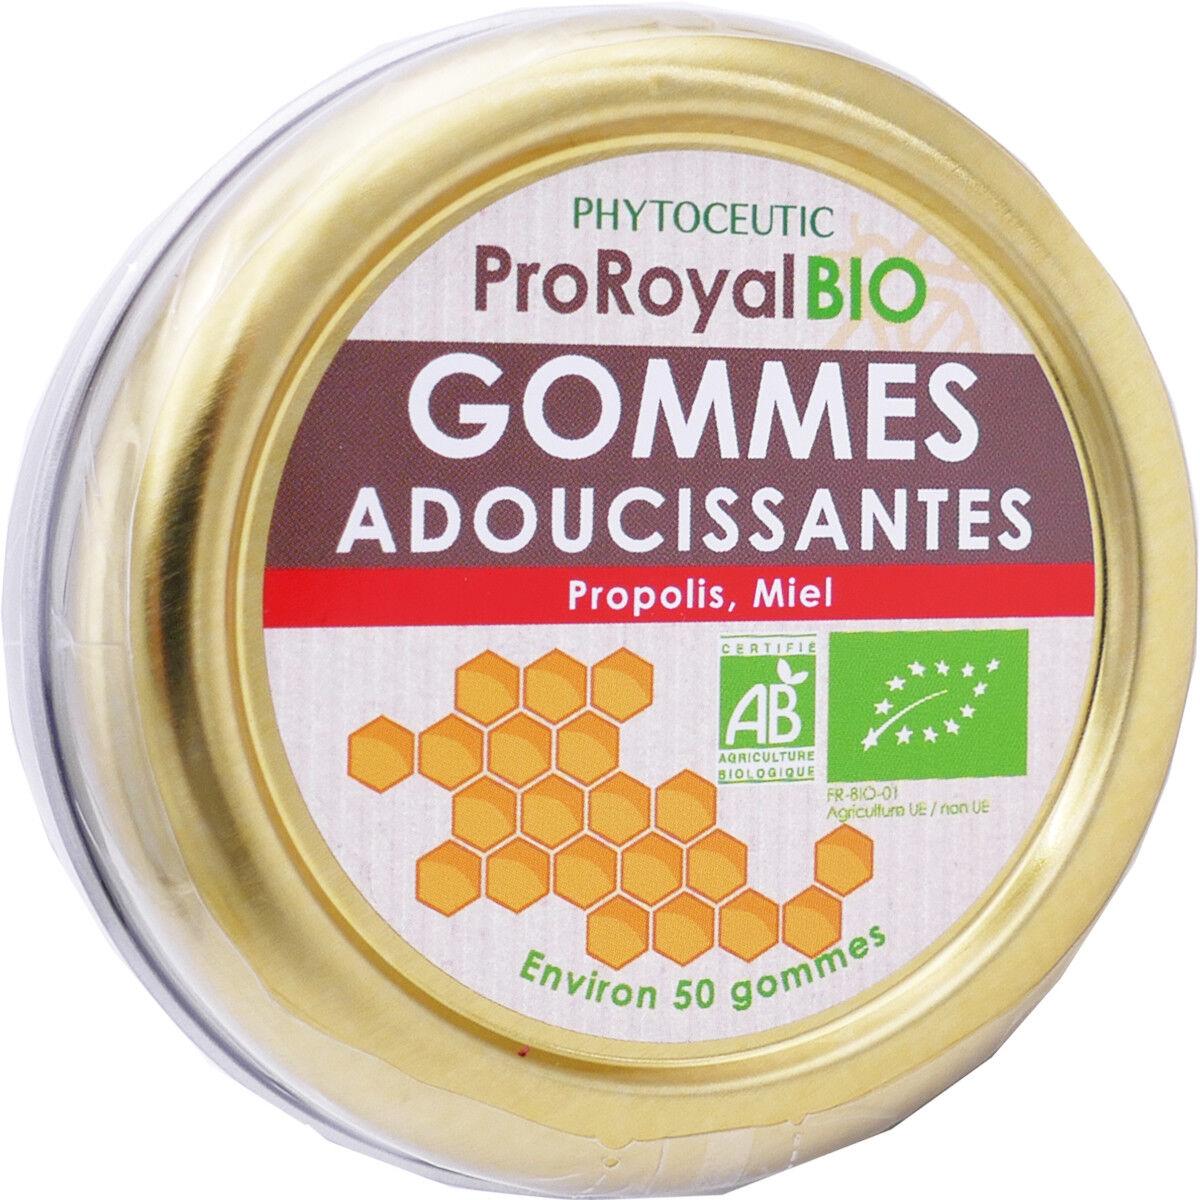 PHYTOCEUTIC Pro-royal bio gommes adoucissantes 50g